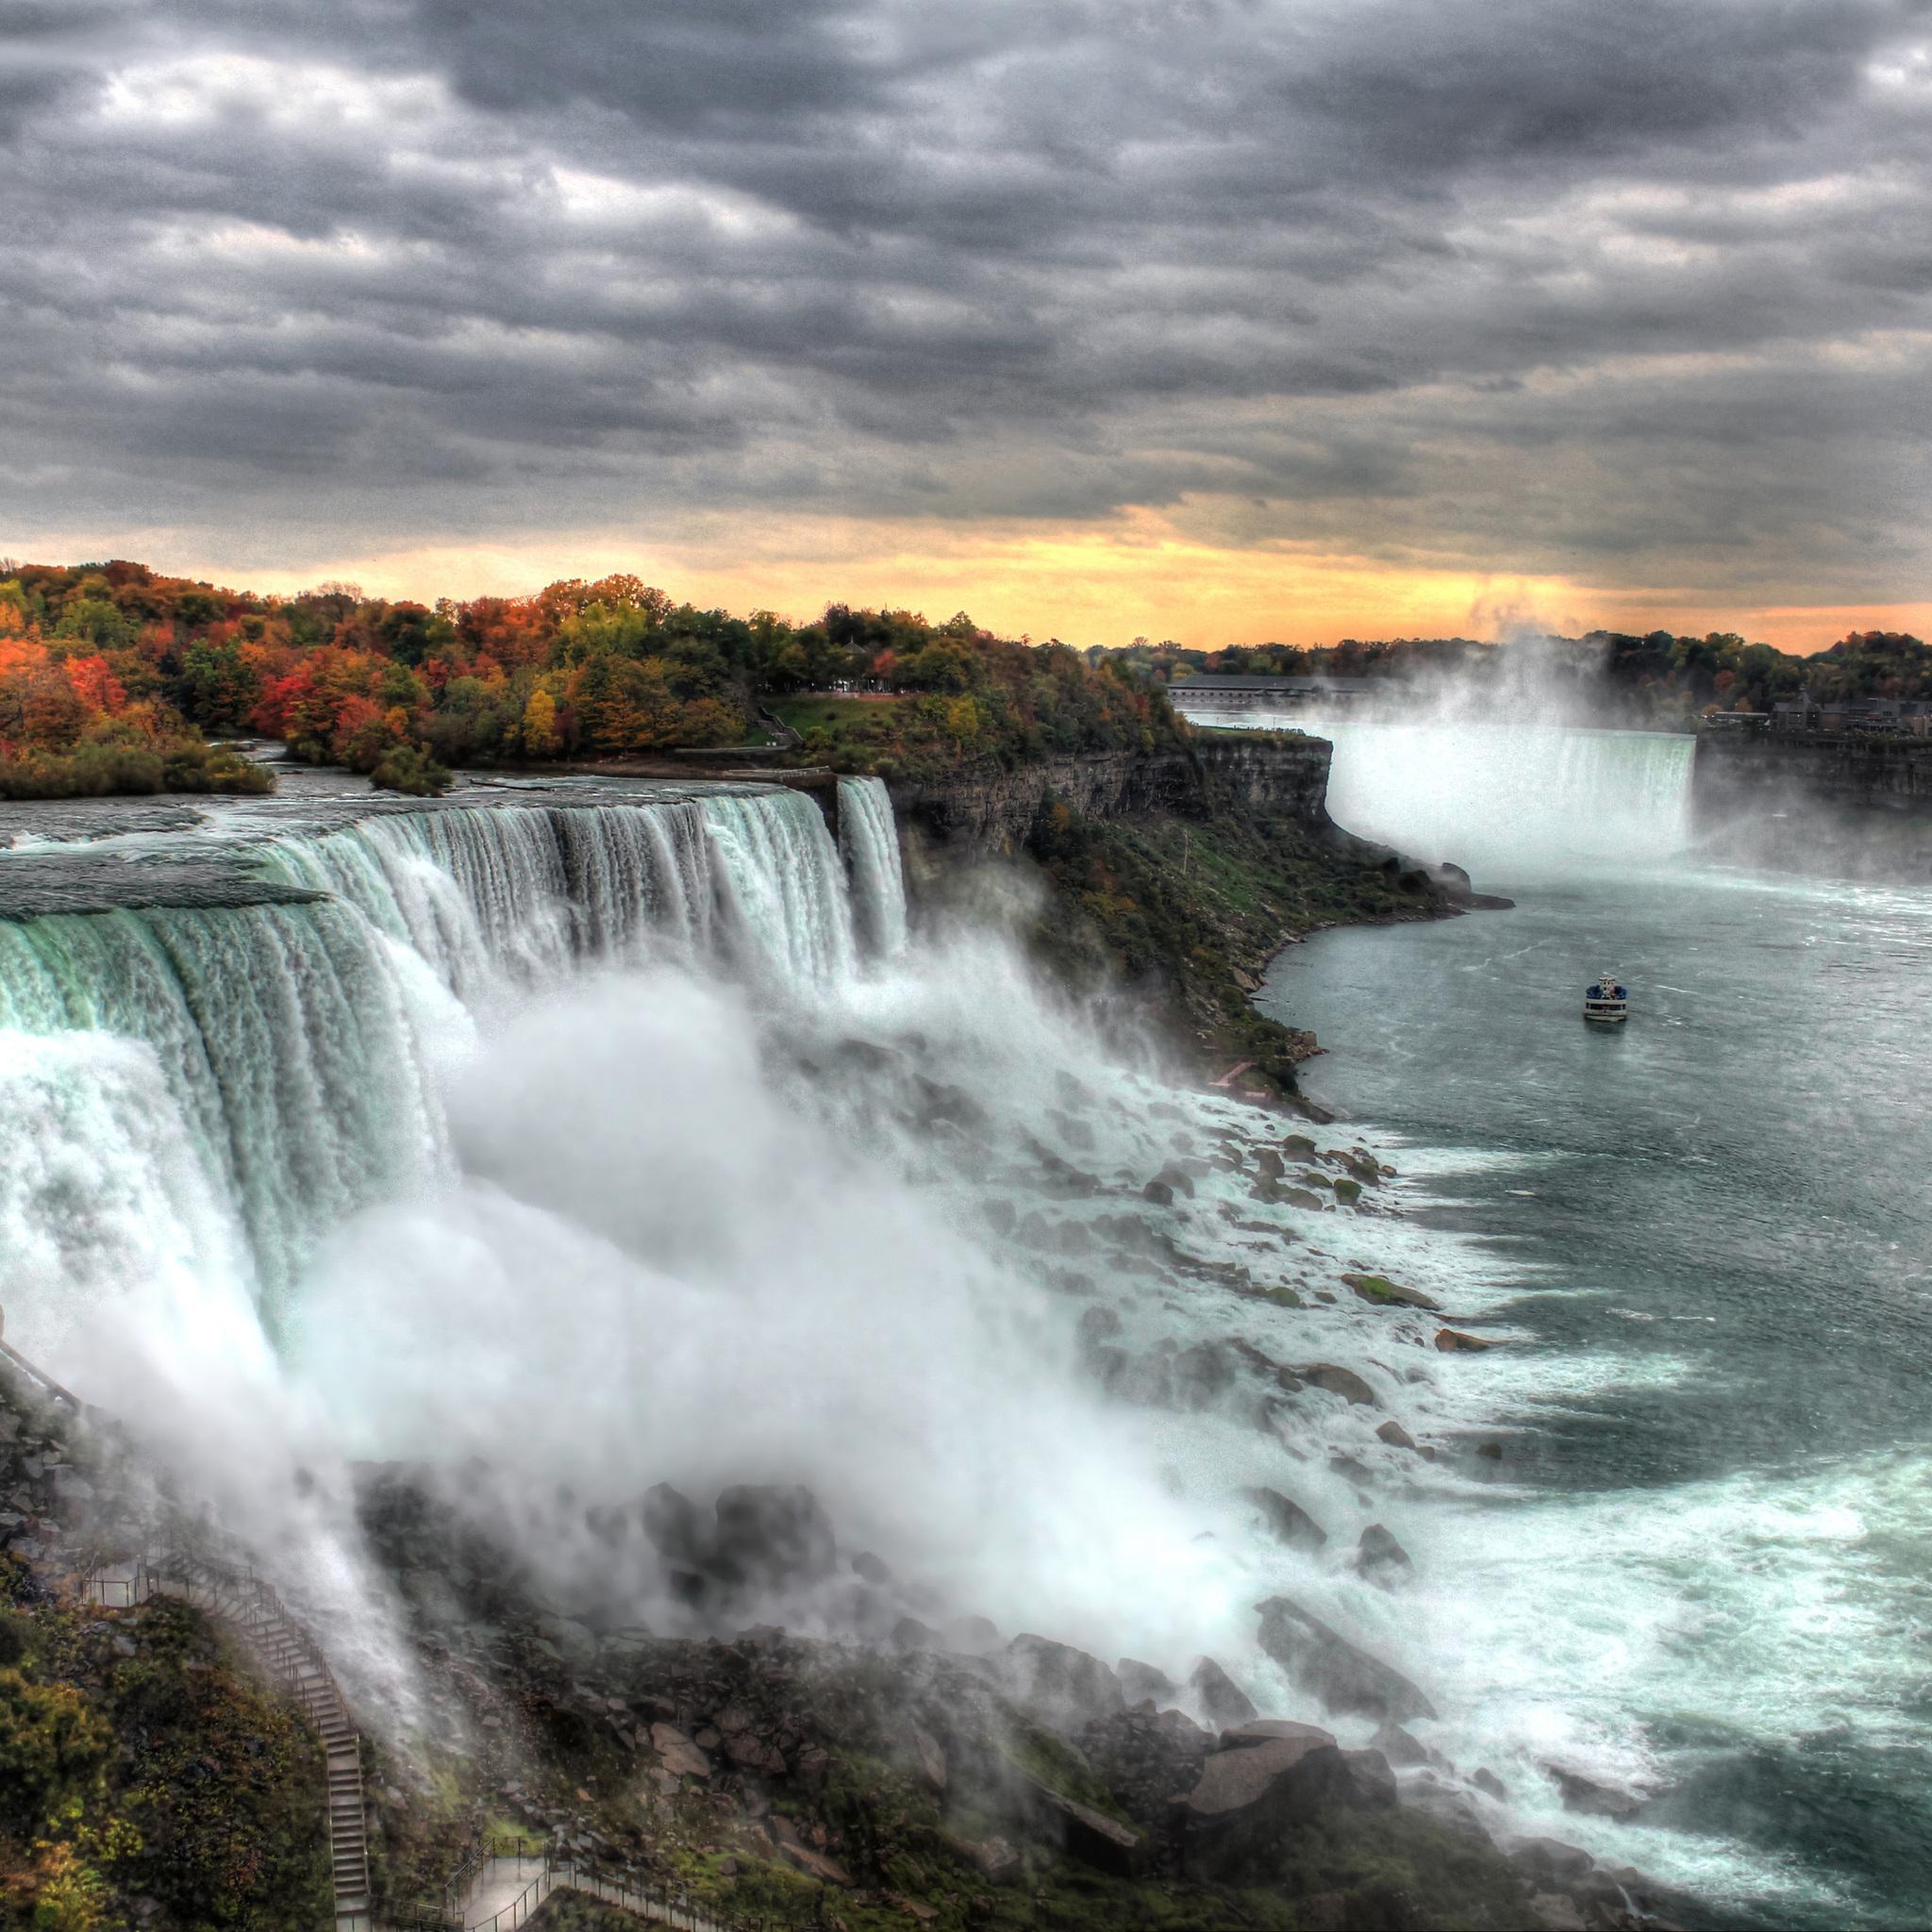 2048x2048 Sunset At Niagara Falls 5k Ipad Air Hd 4k